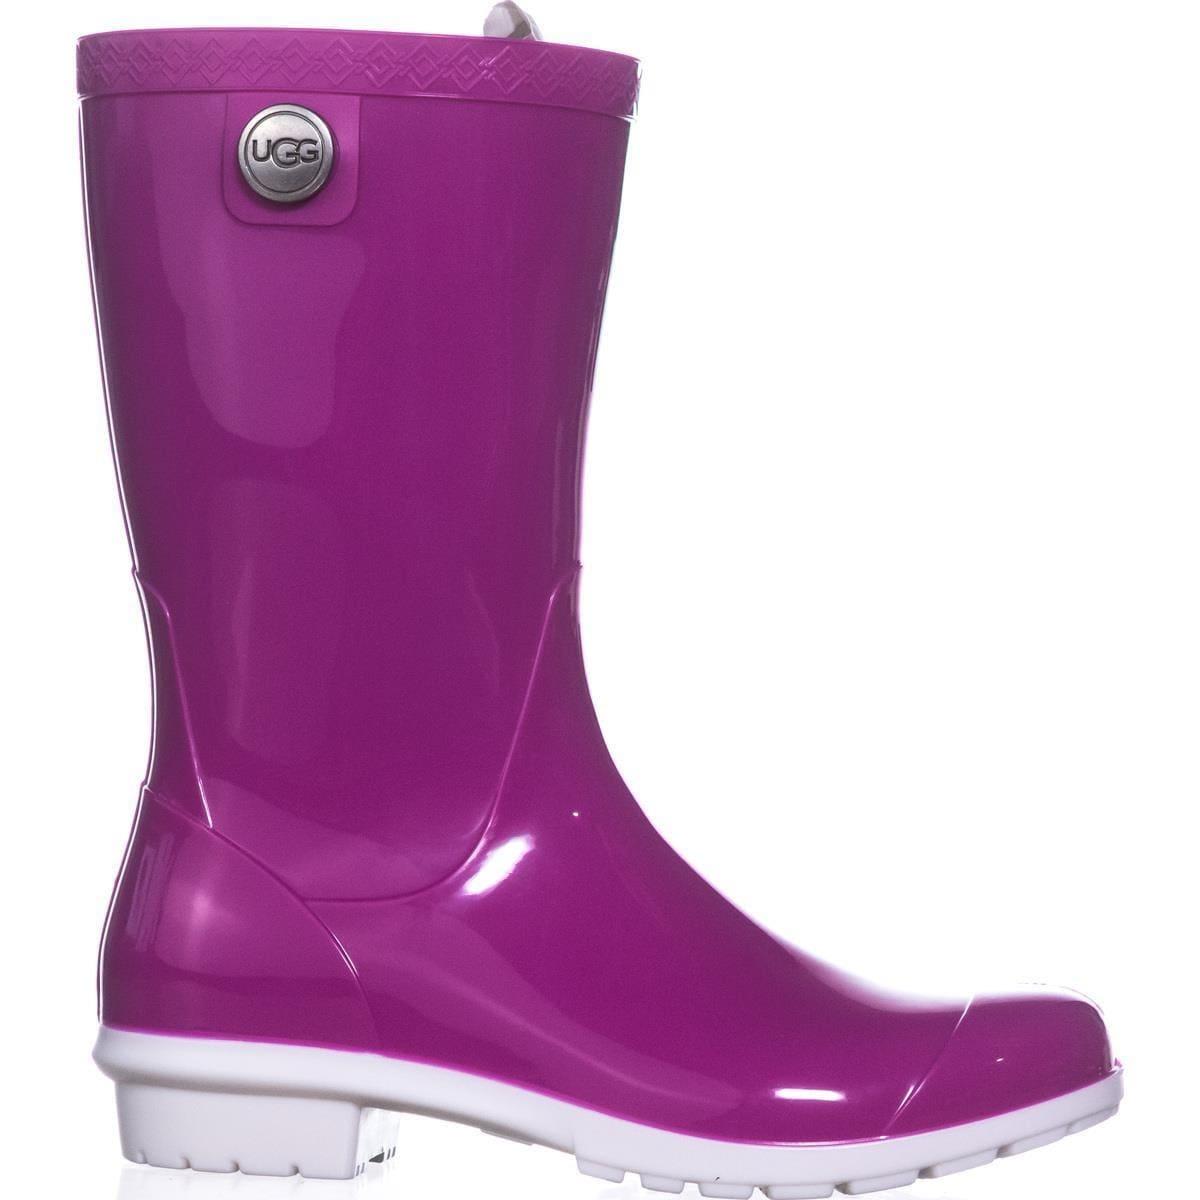 3eb0dcc2c1f UGG Sienna Mid-Calf Rain Boots, Neon Pink - 5 us / 36 eu